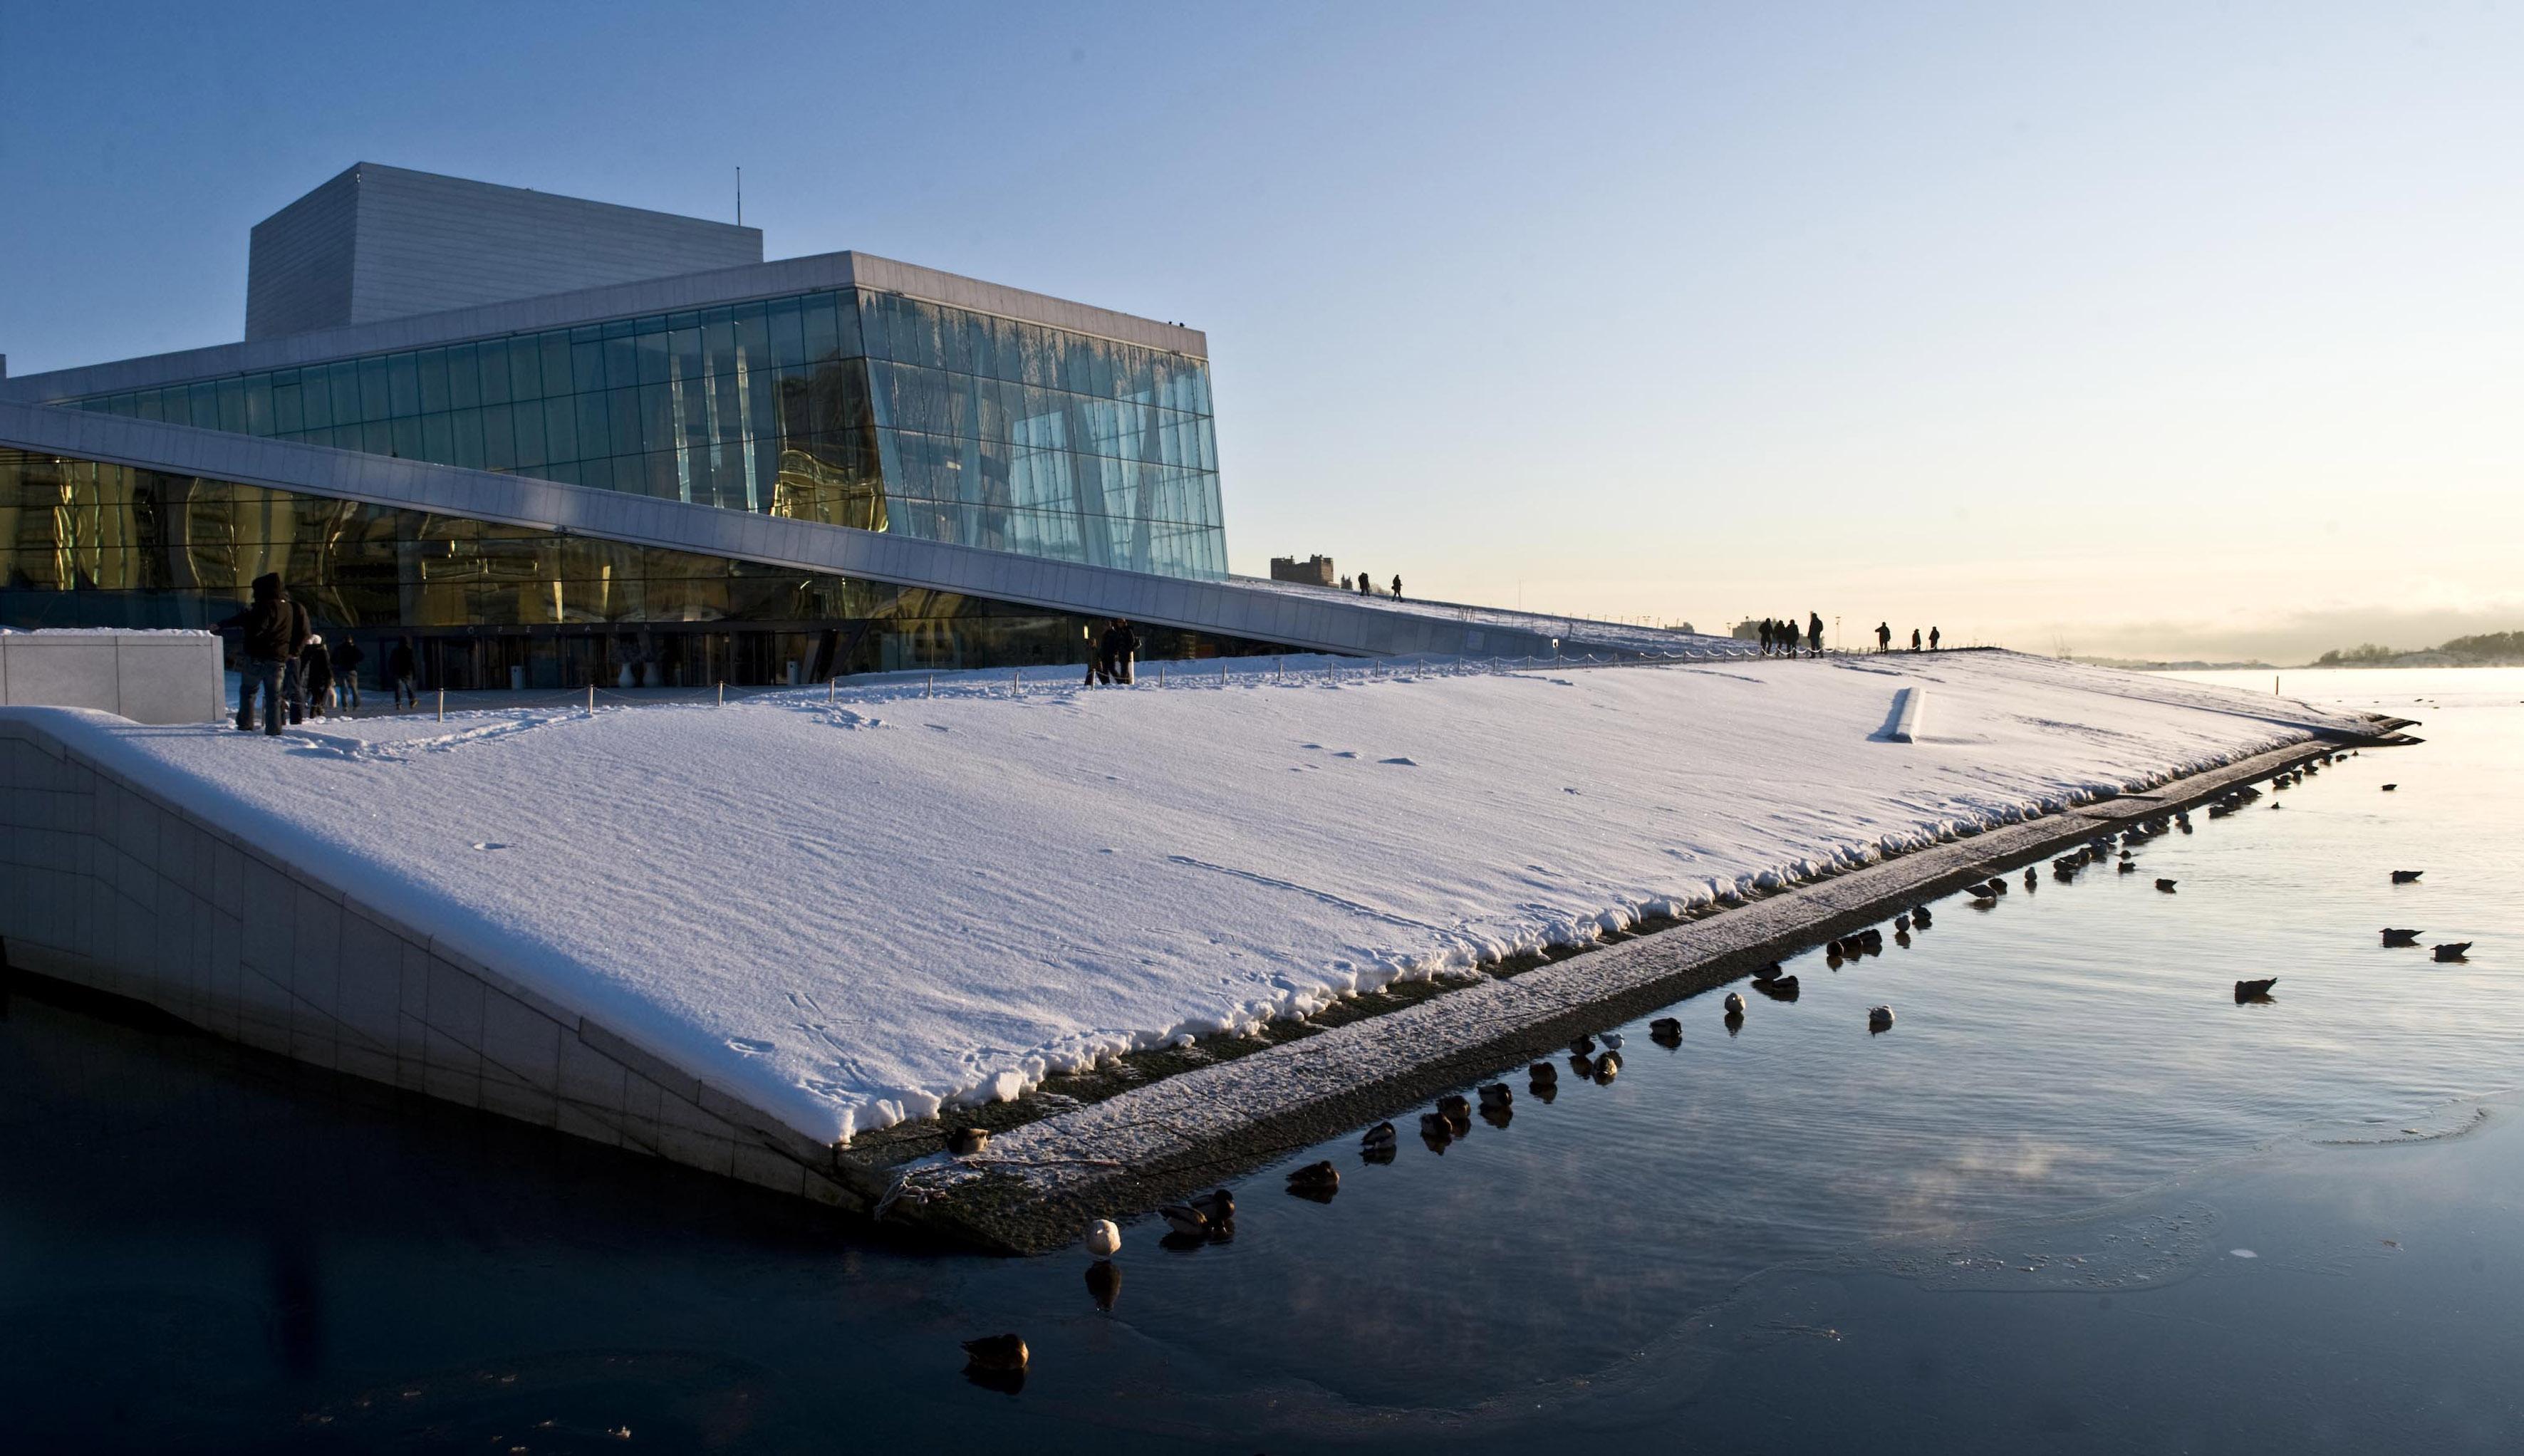 Oslo Opera House in winter